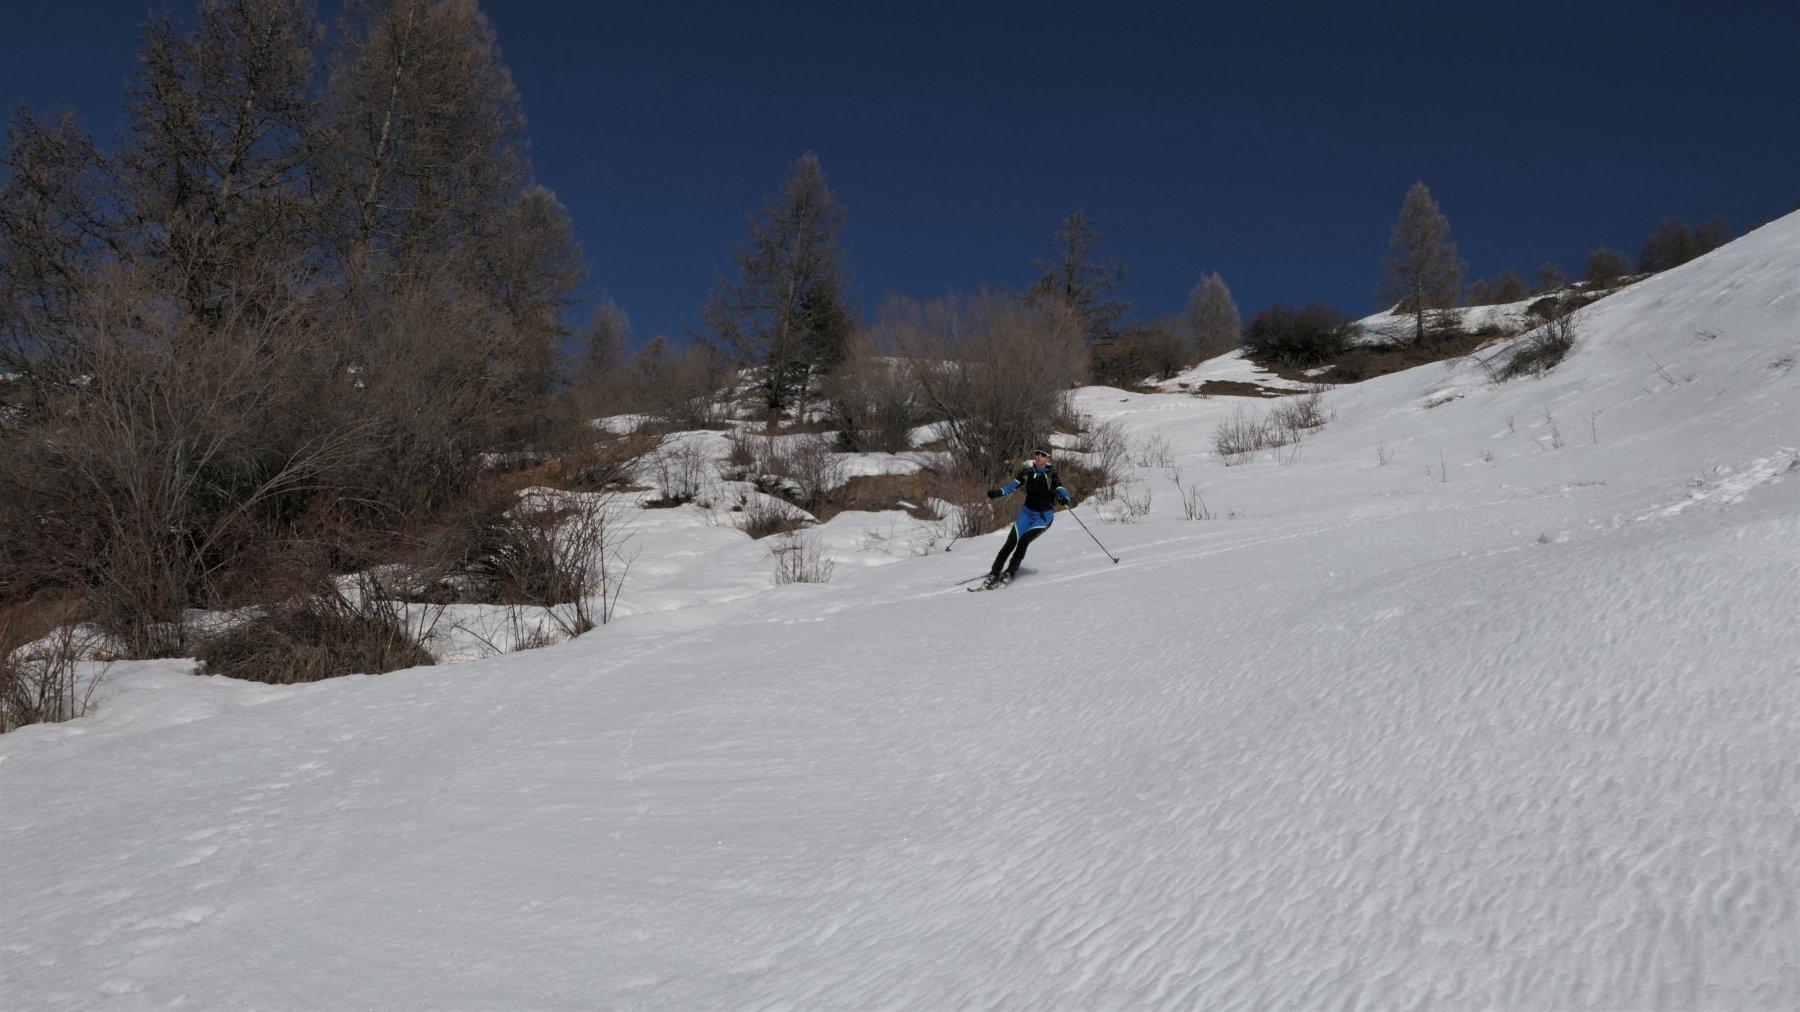 parte bassa su ottima neve